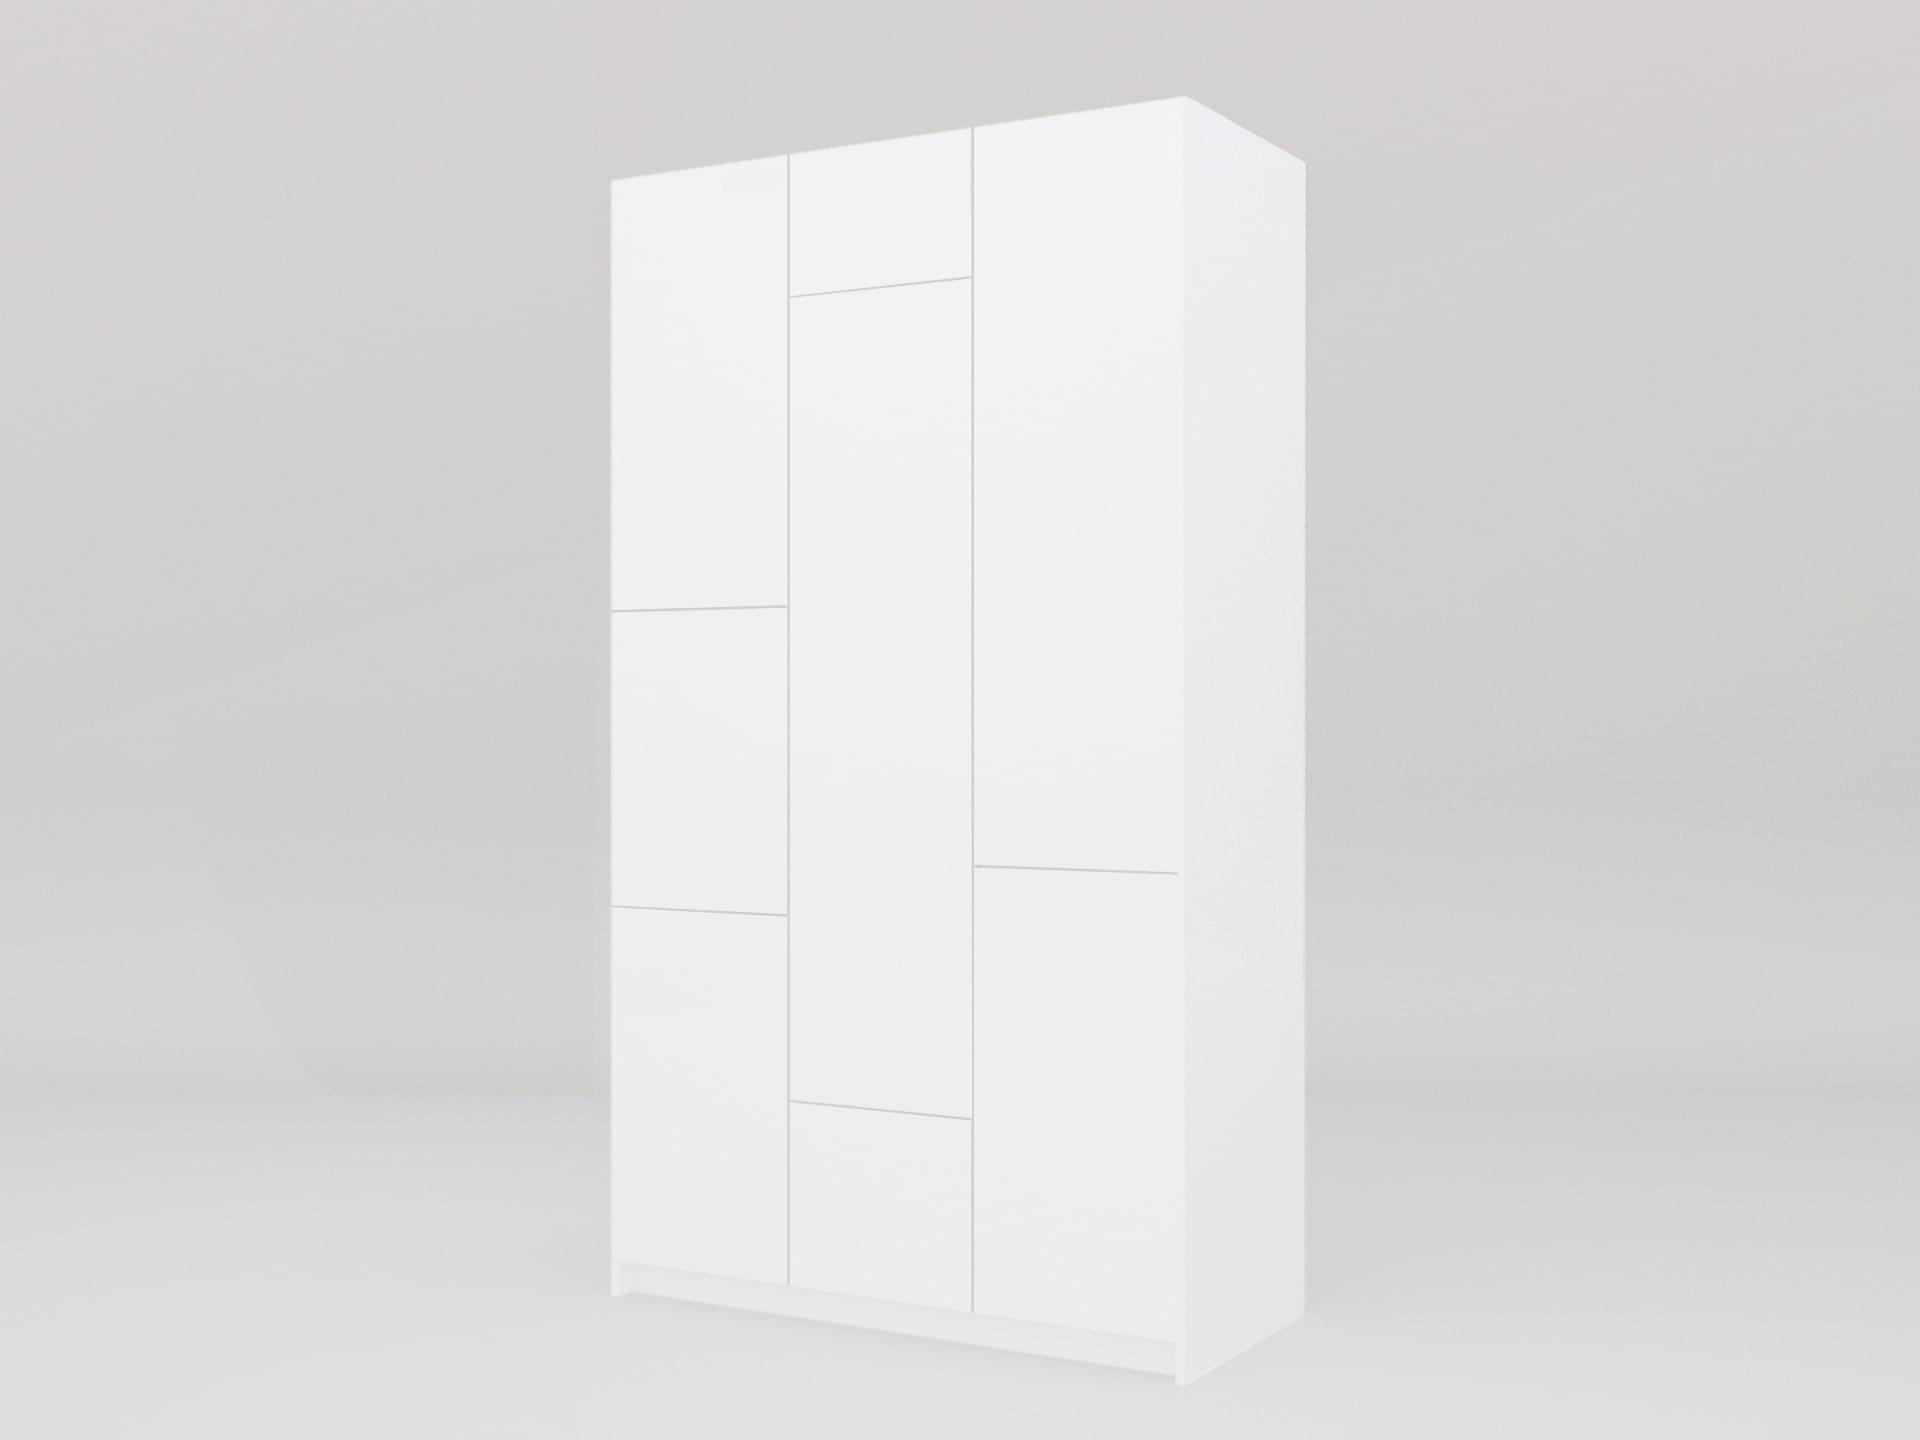 Lemari Pakaian Minimalis All White Bauhaus